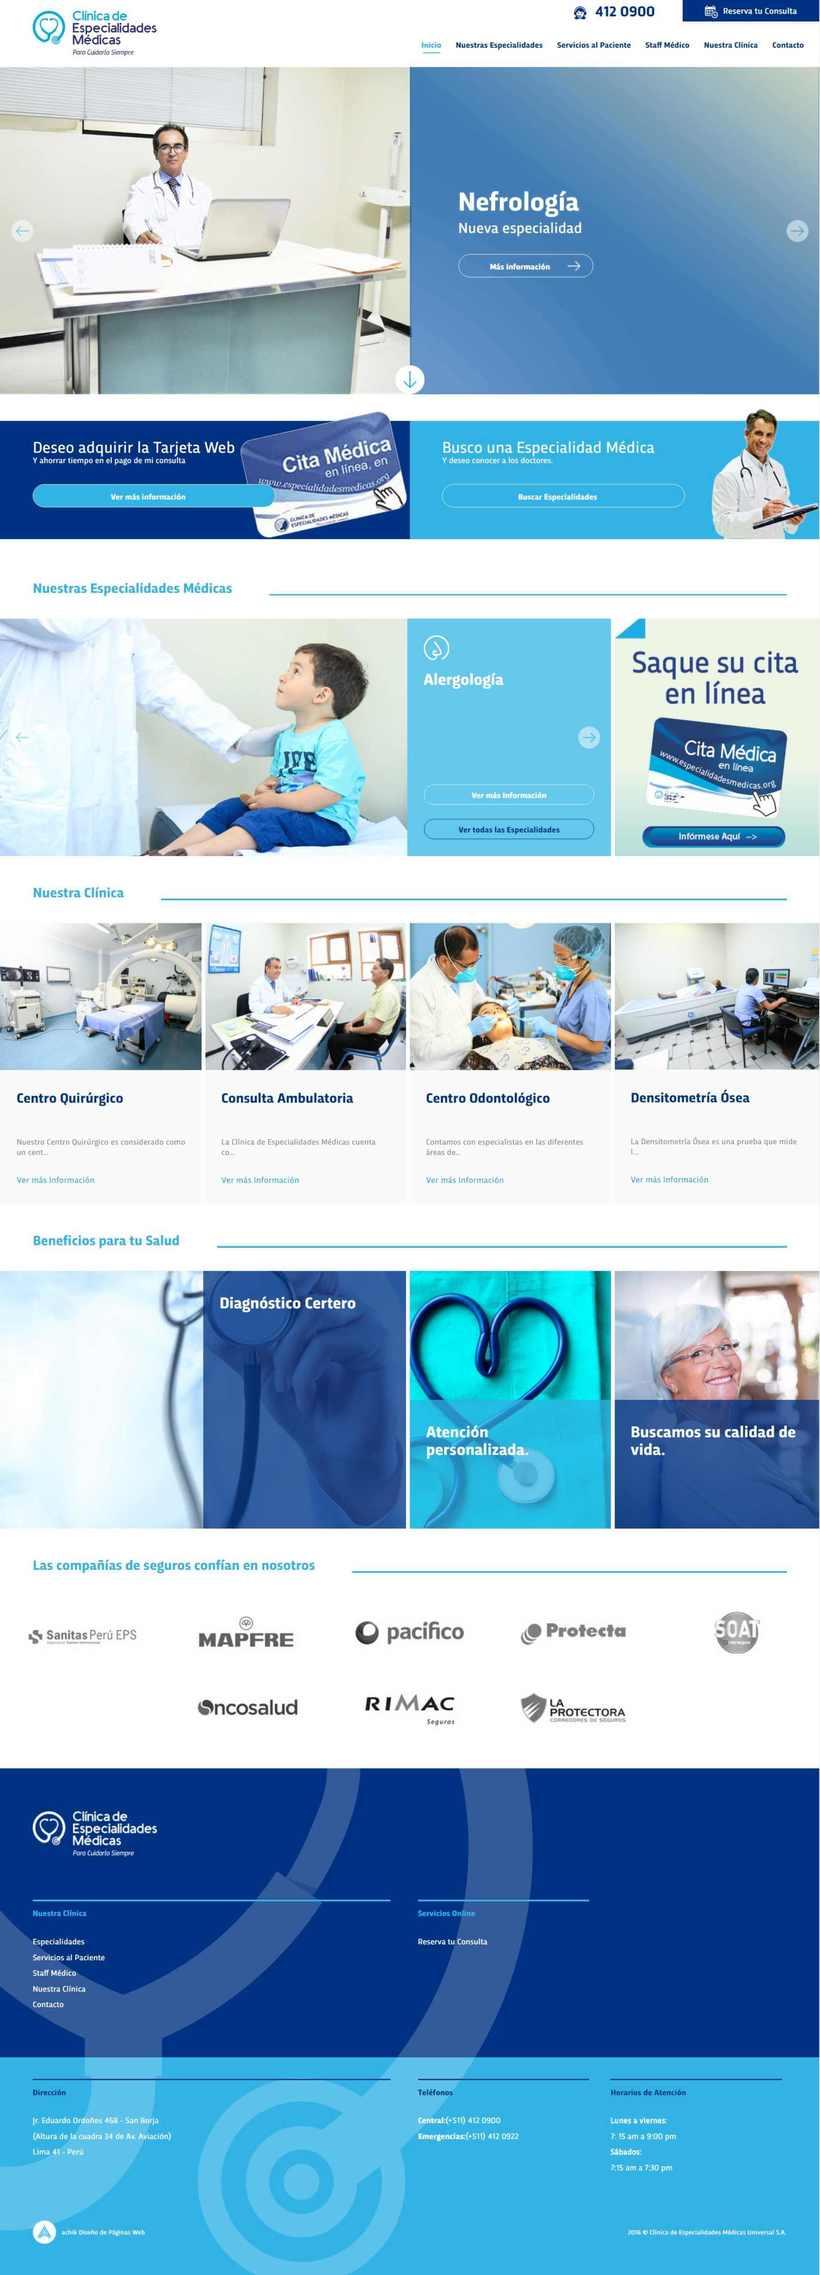 Clínica Especialidades Médicas -1